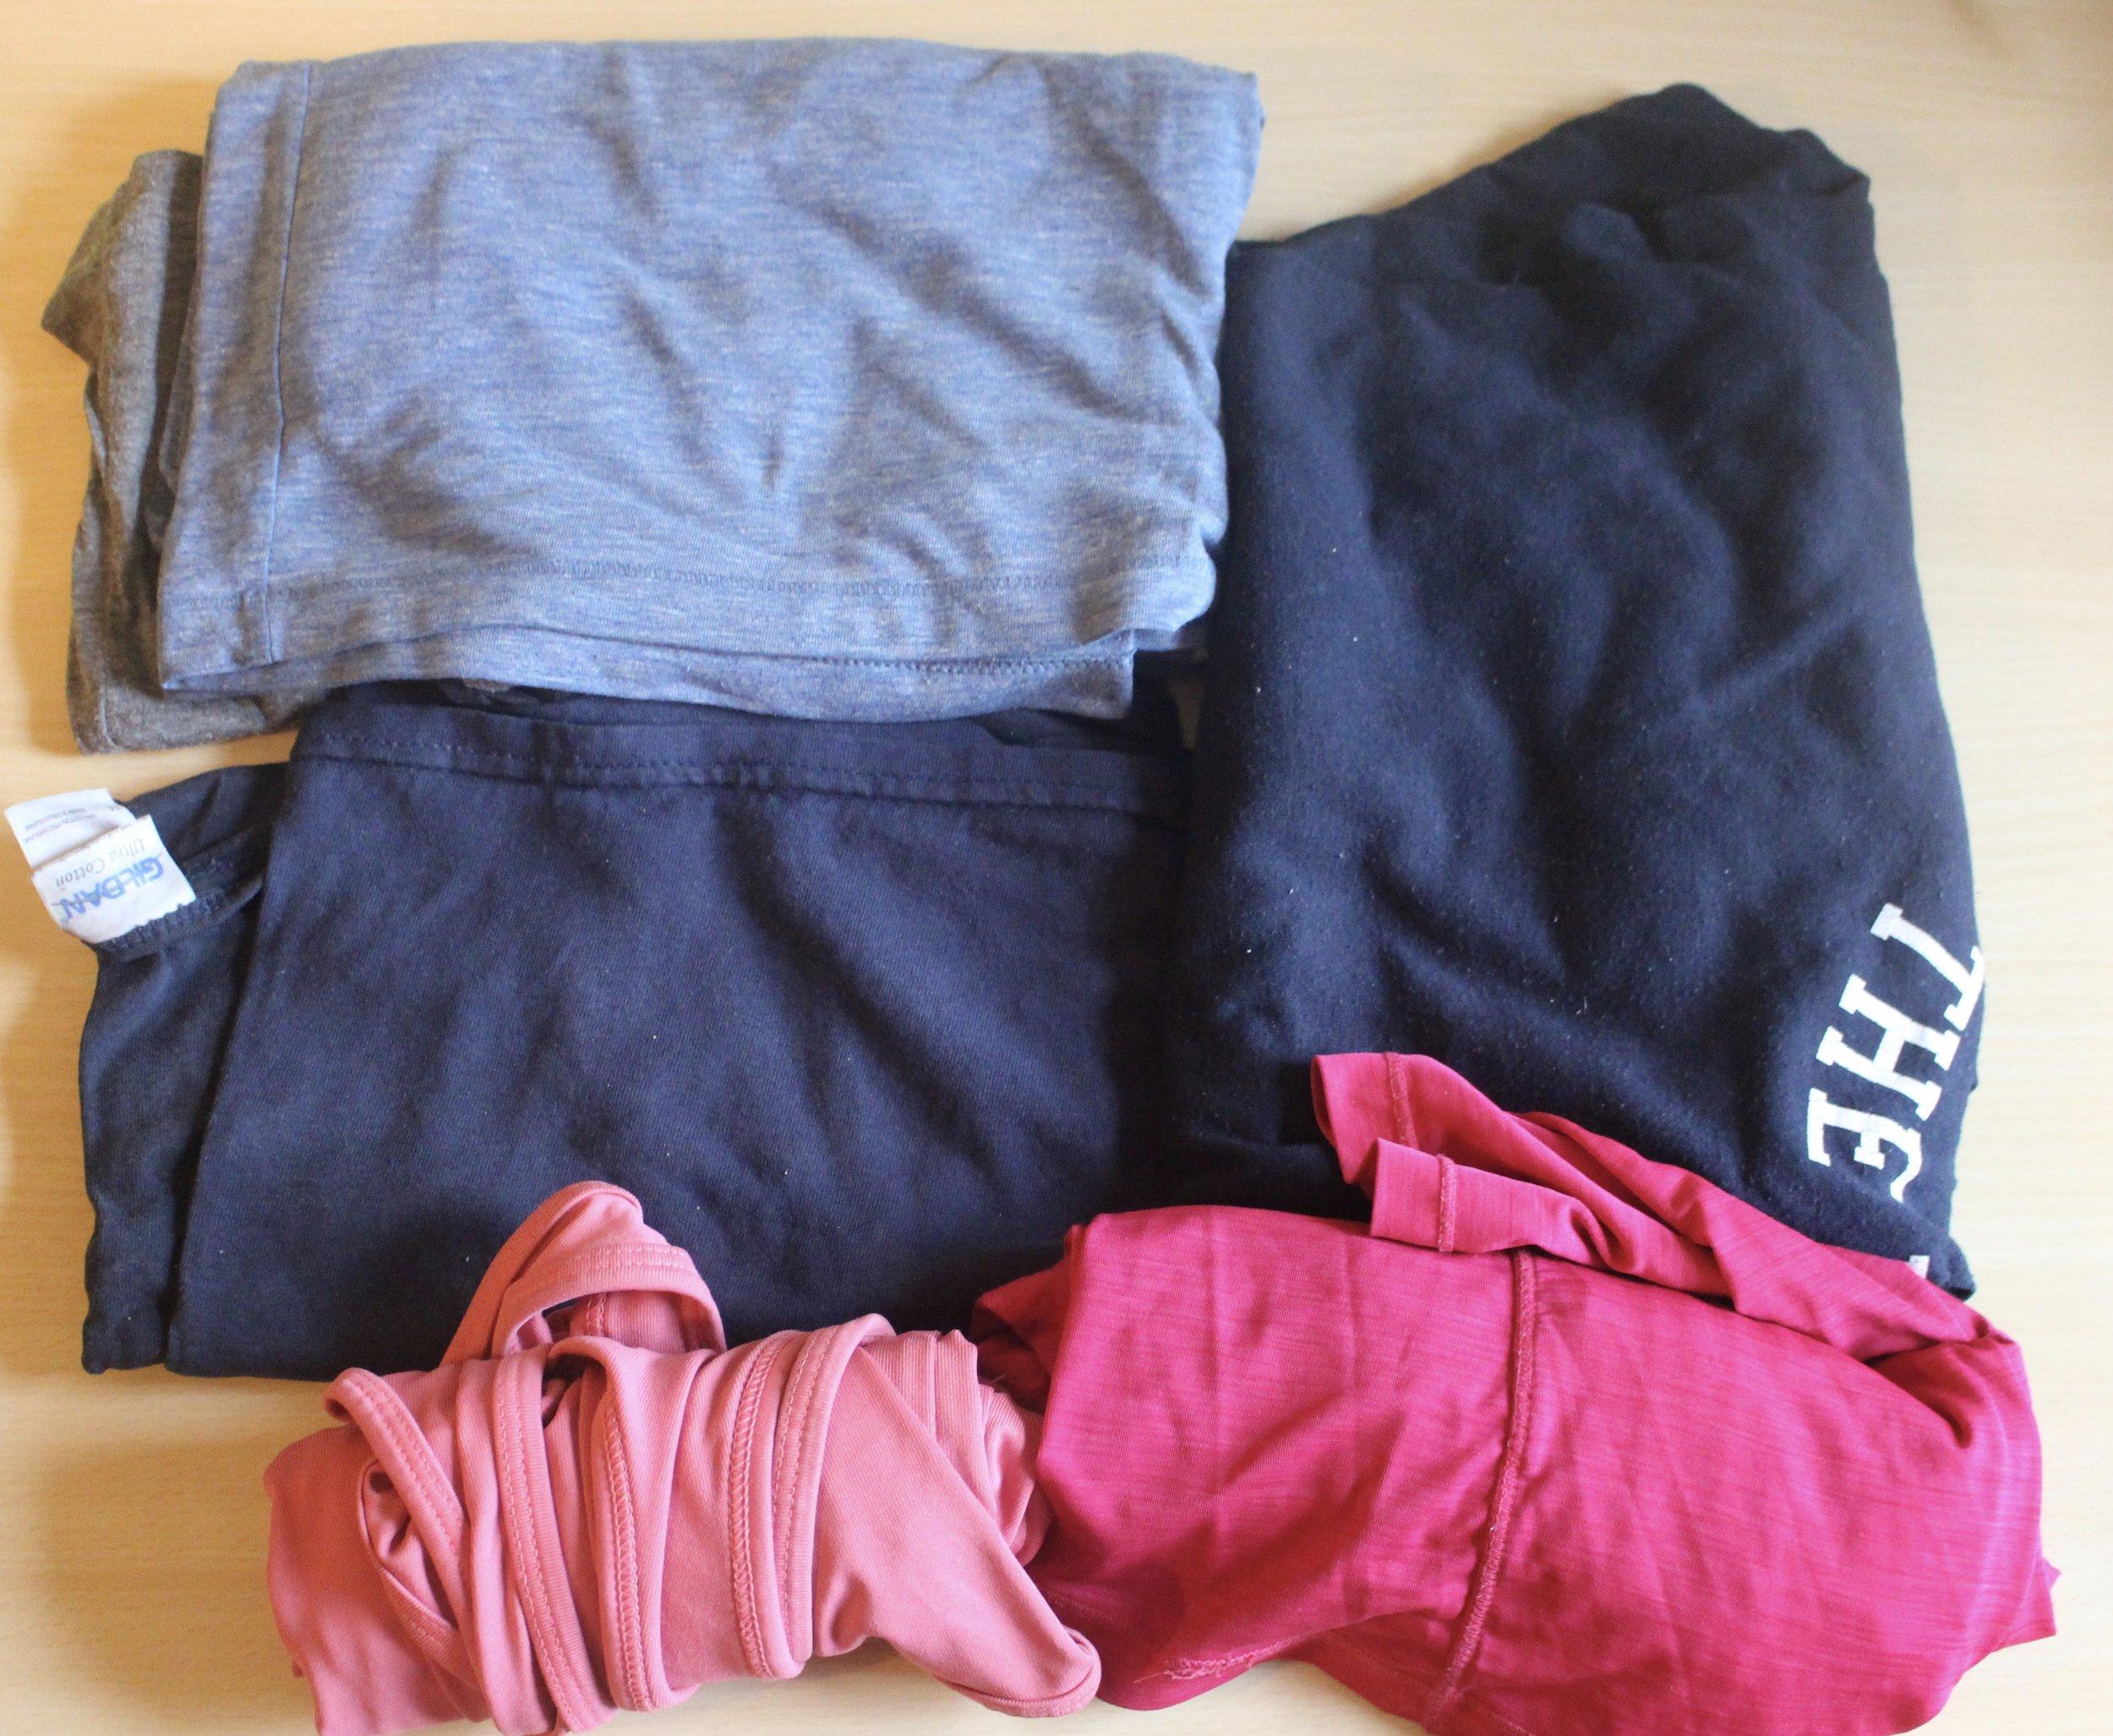 Shirts packing list